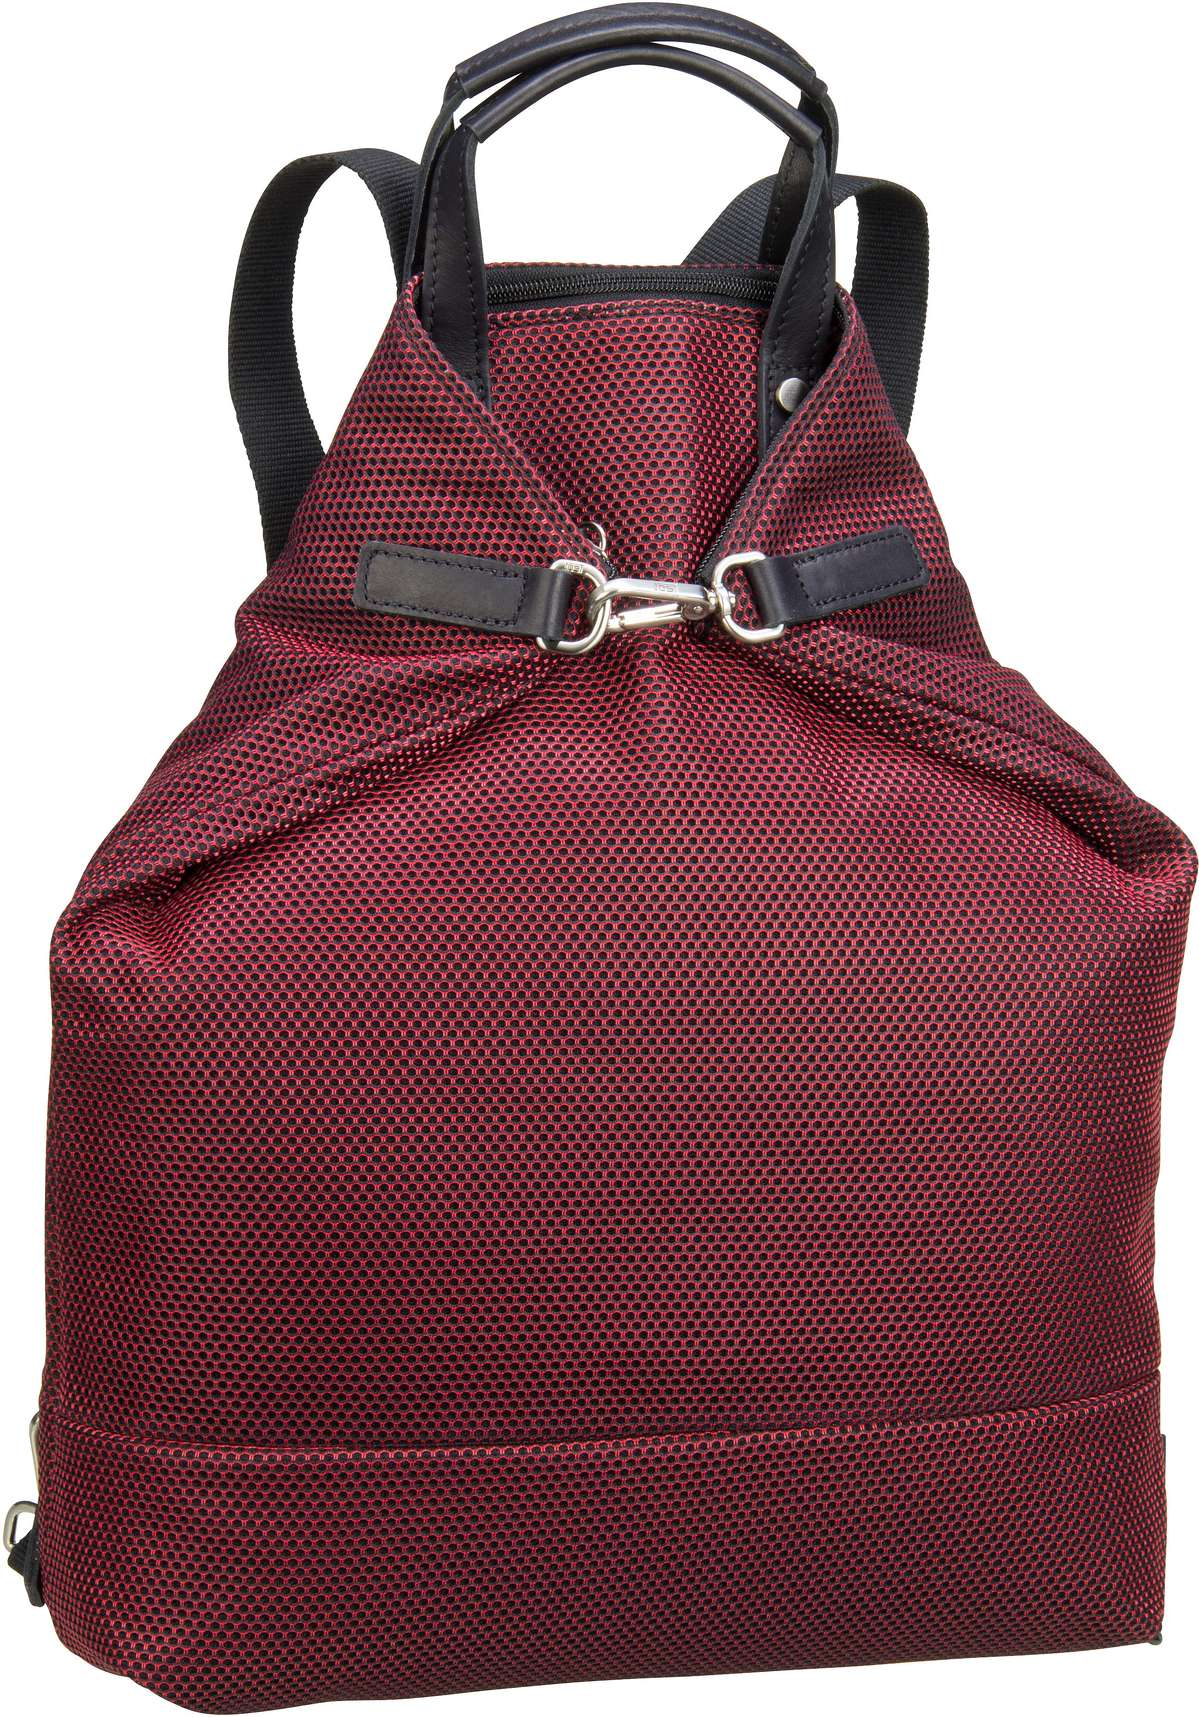 Rucksack / Daypack Mesh 6170 X-Change 3in1 Bag M Red